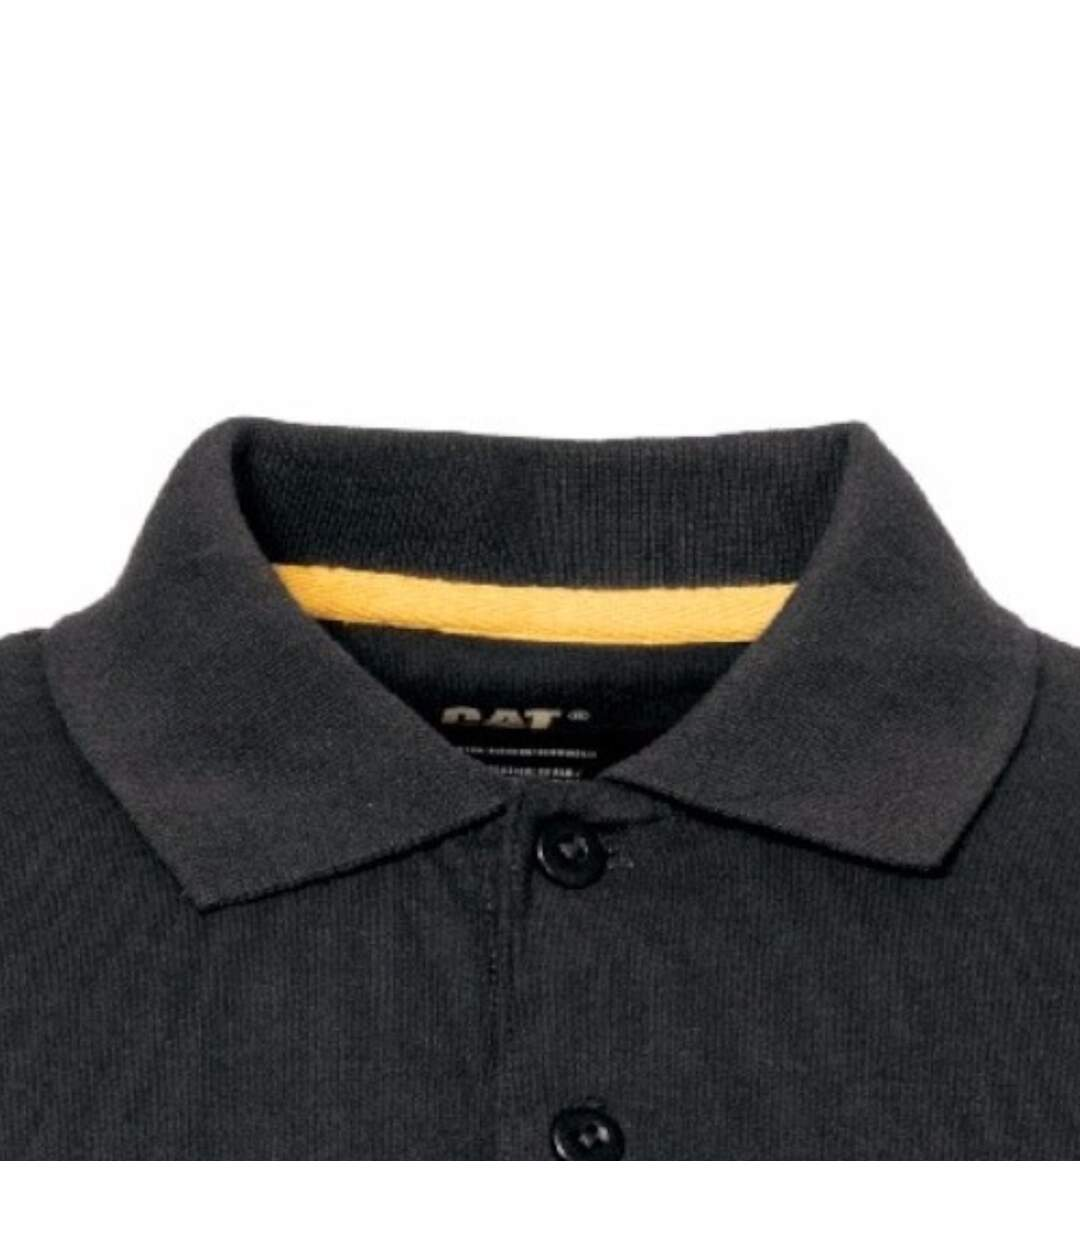 Caterpillar Mens Classic Short Sleeve Polo Shirt (Black) - UTFS4252